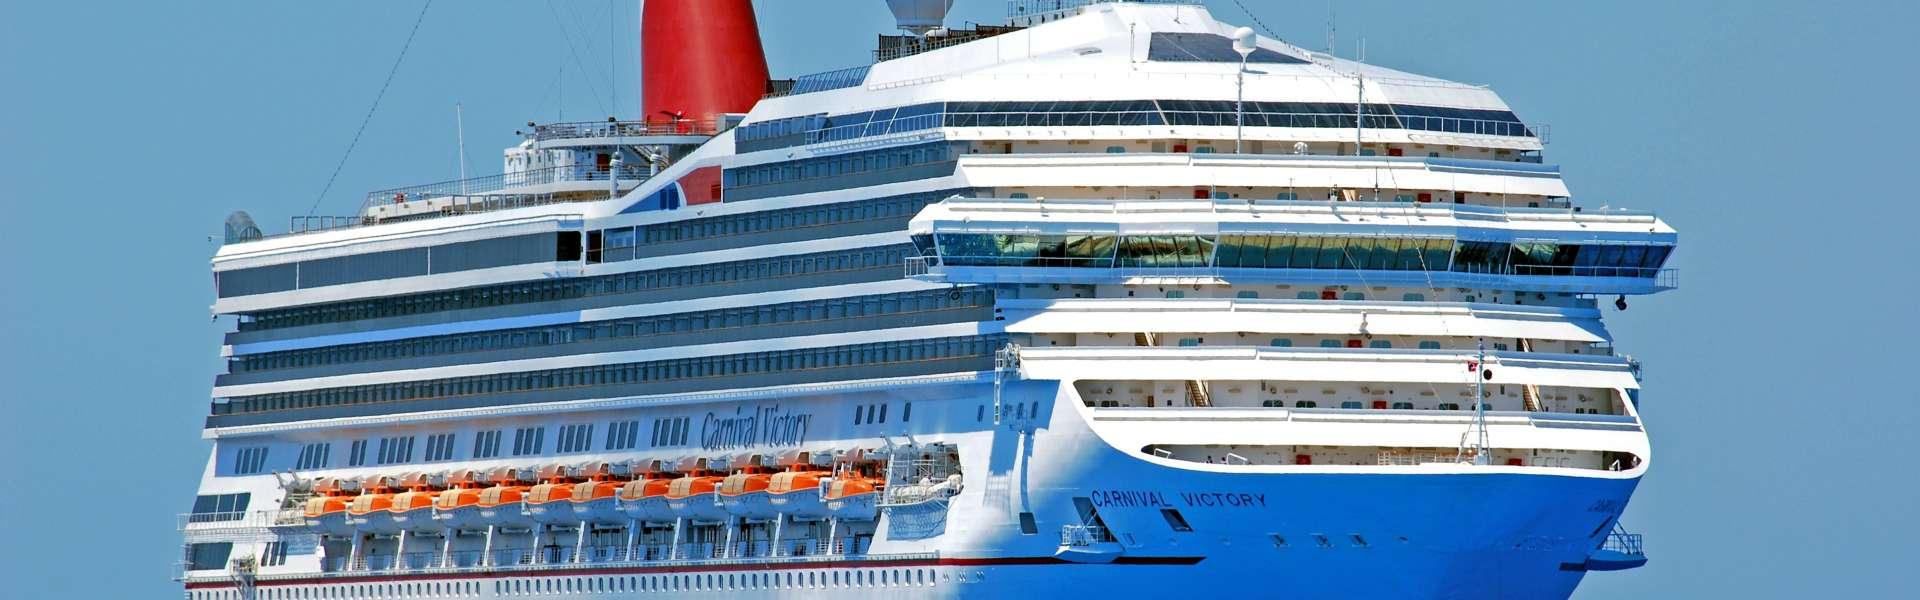 Croaziera 2019 - Bahamas (Miami) - Carnival Cruise Lines - Carnival Victory - 3 nopti